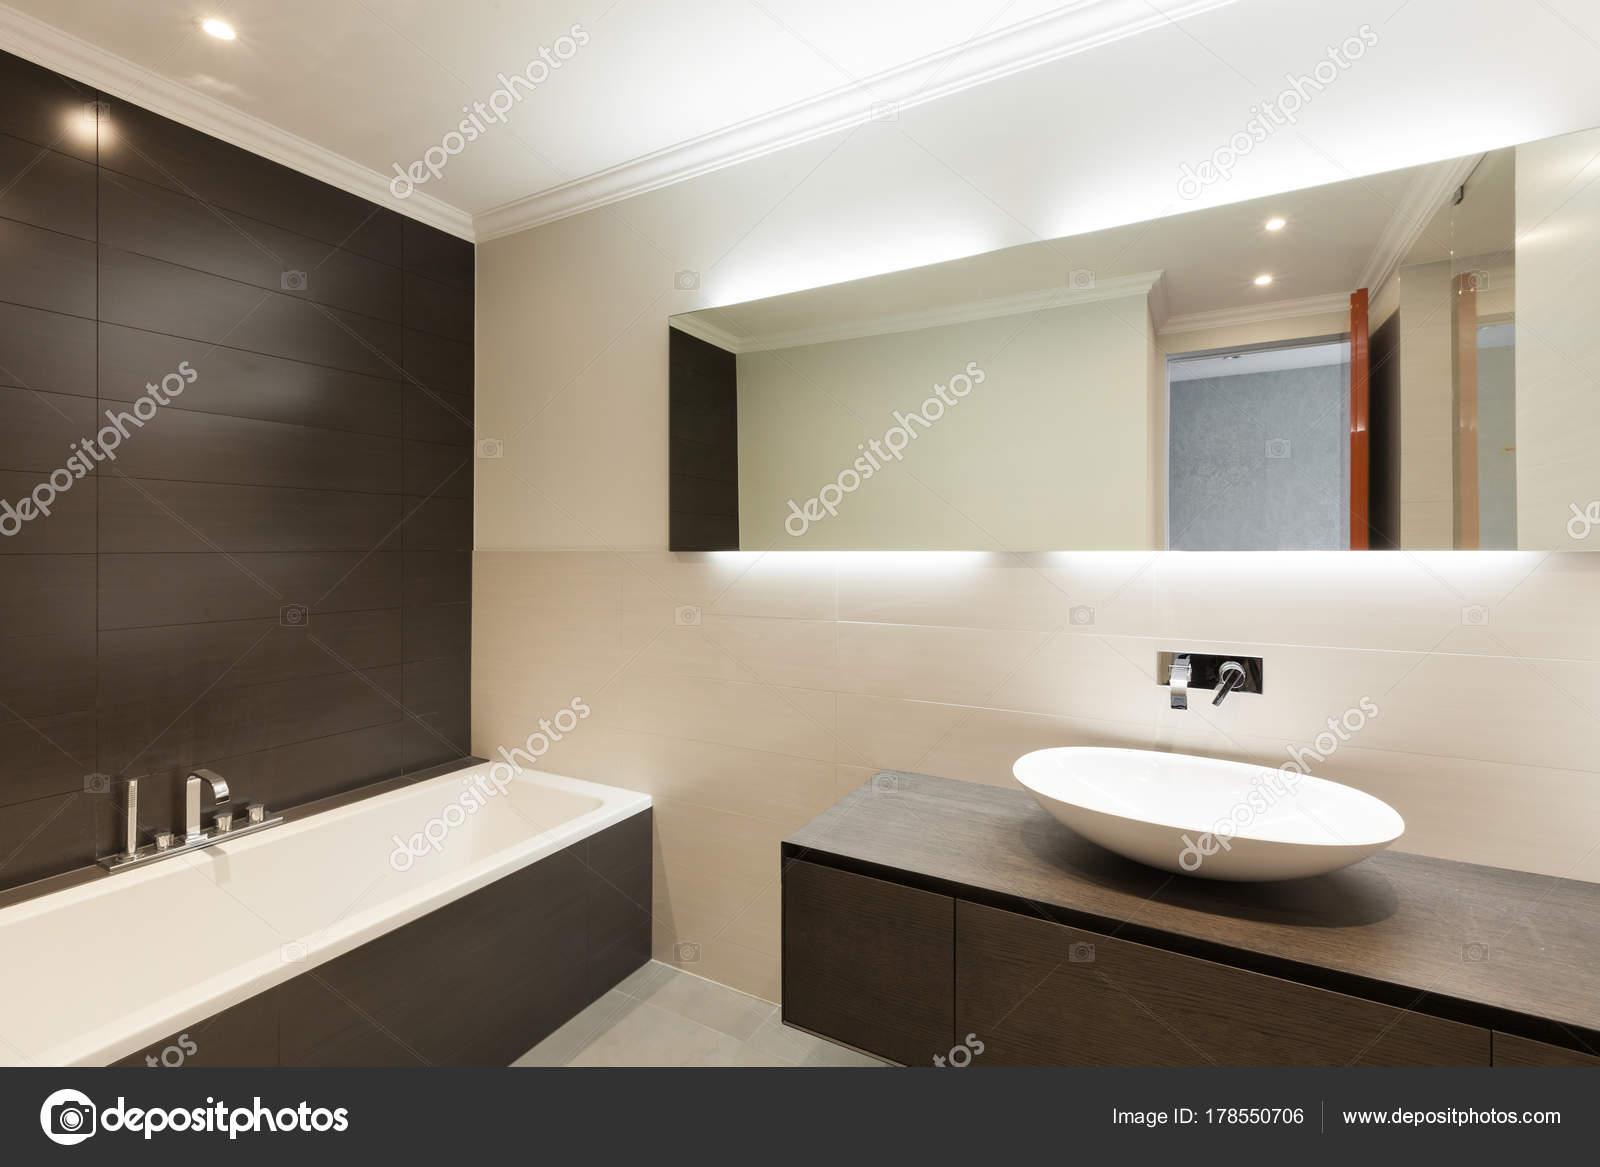 Moderne badkamers interieur inrichting